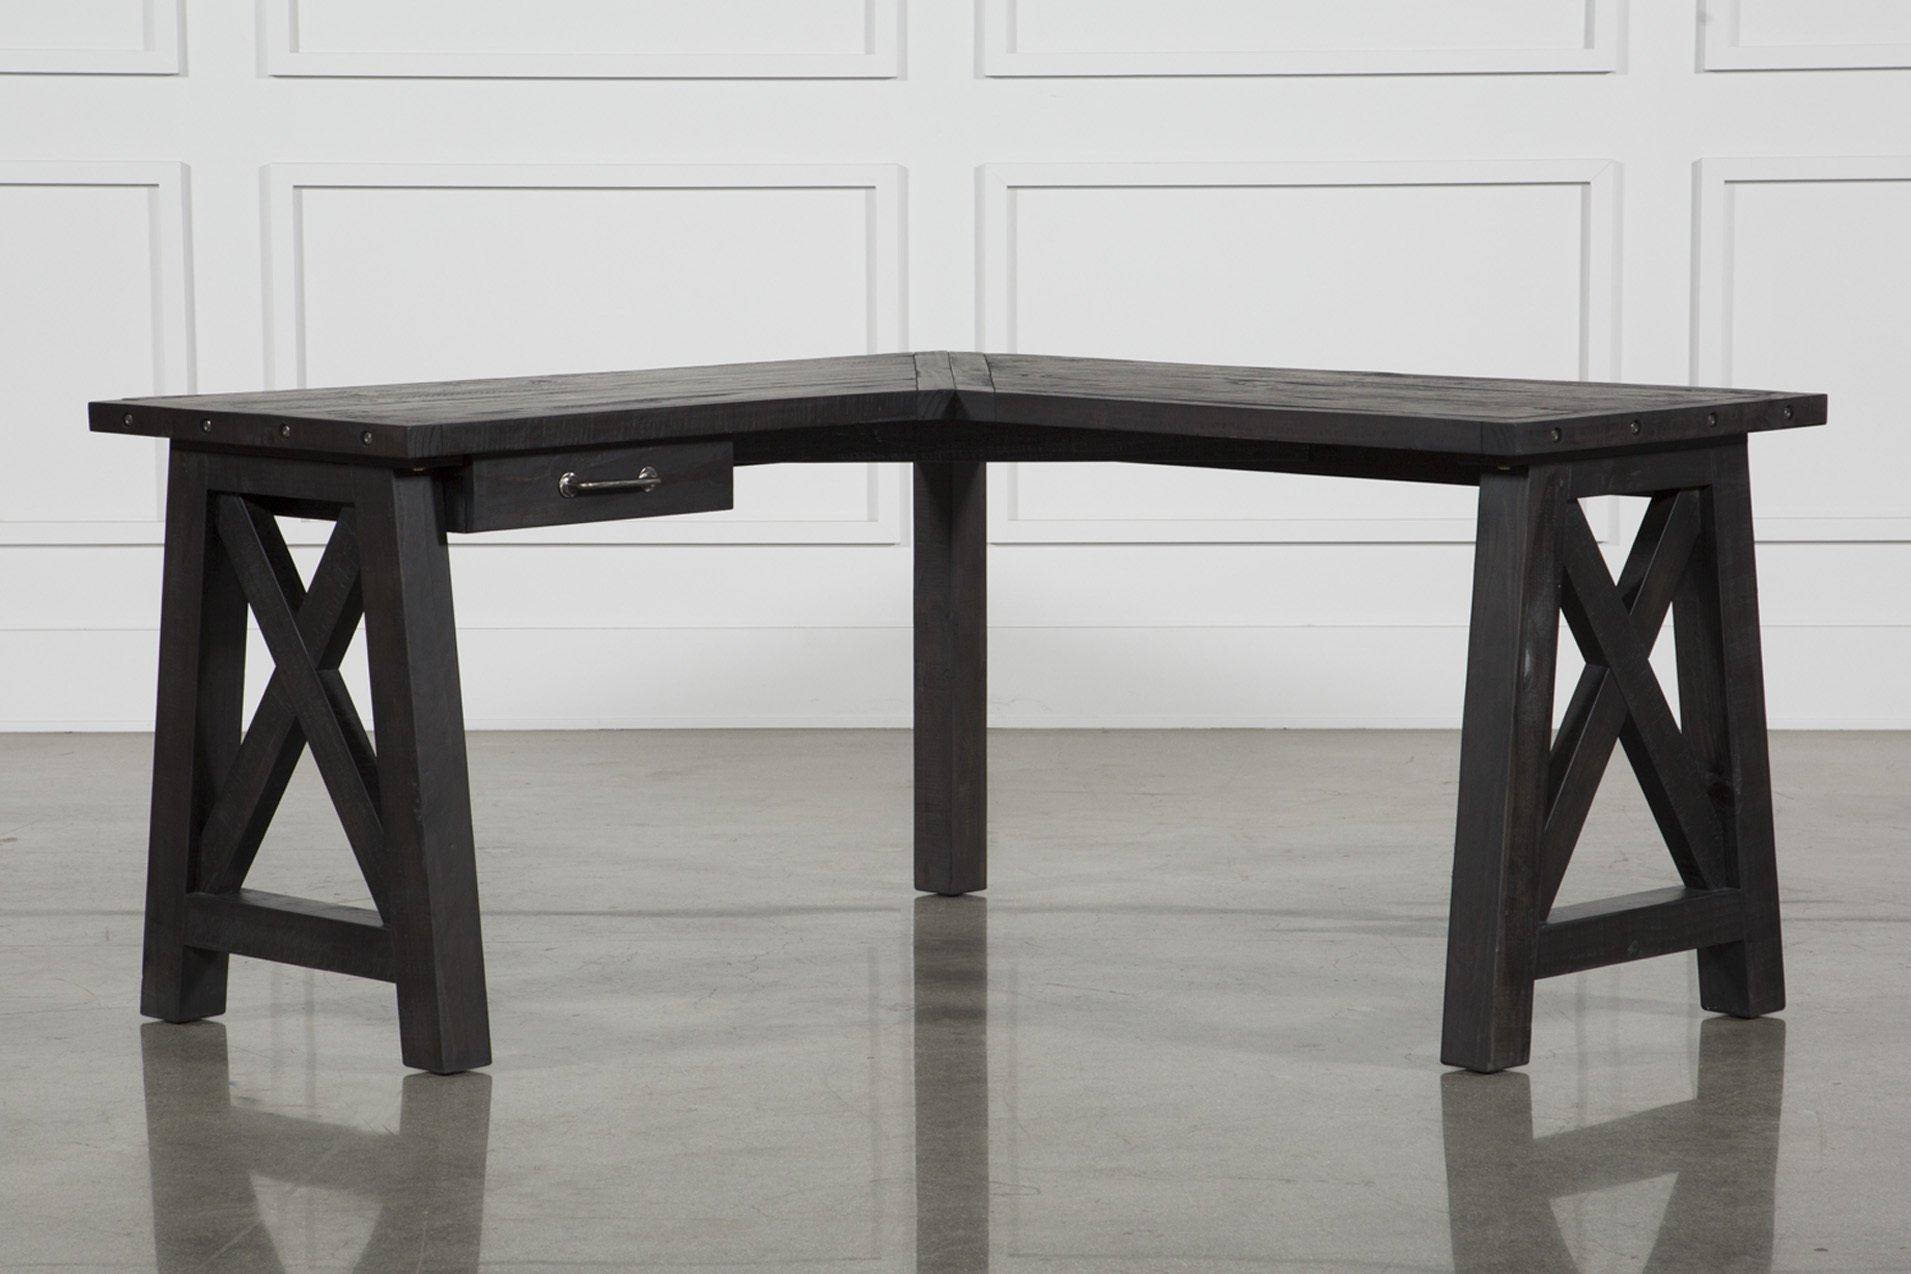 Corner table jaxon corner desk - 360 MQEFJHT